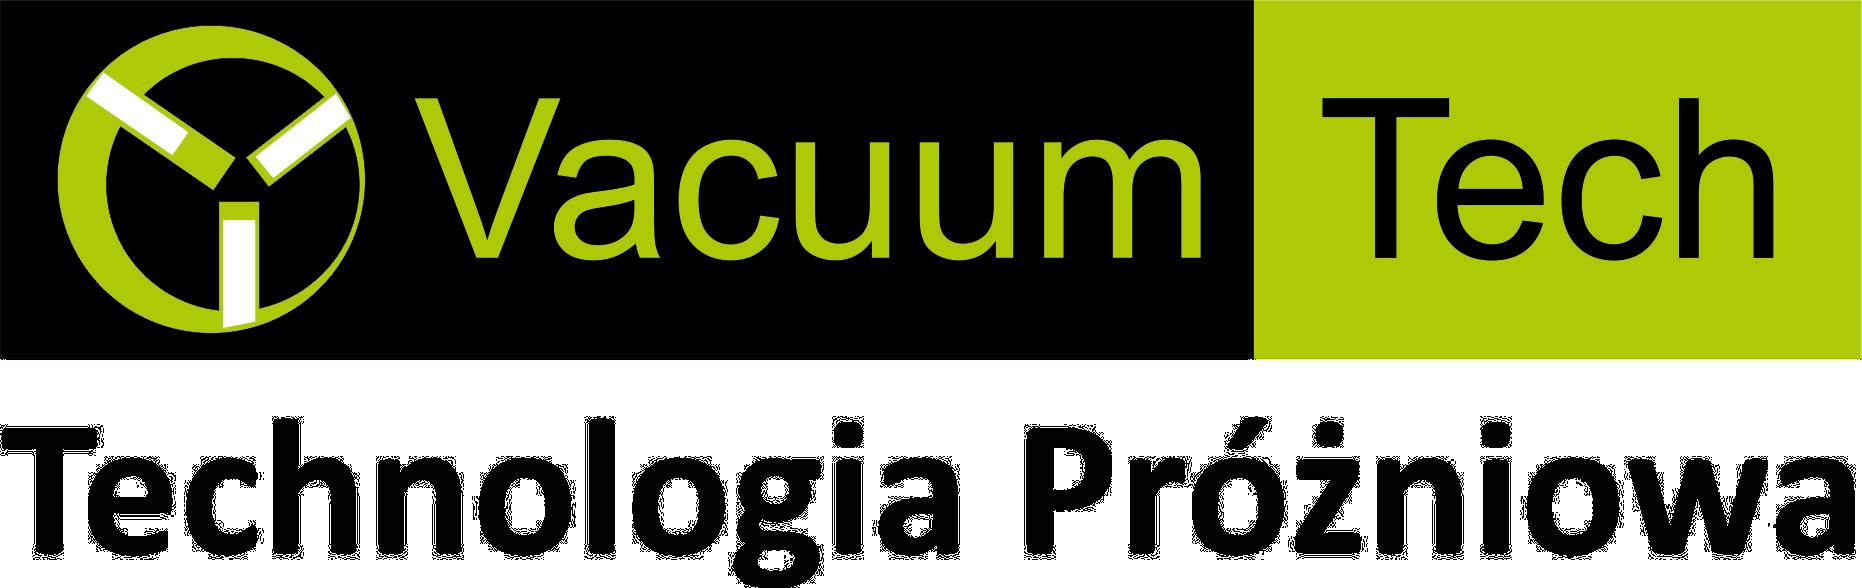 Vacuum-Tech